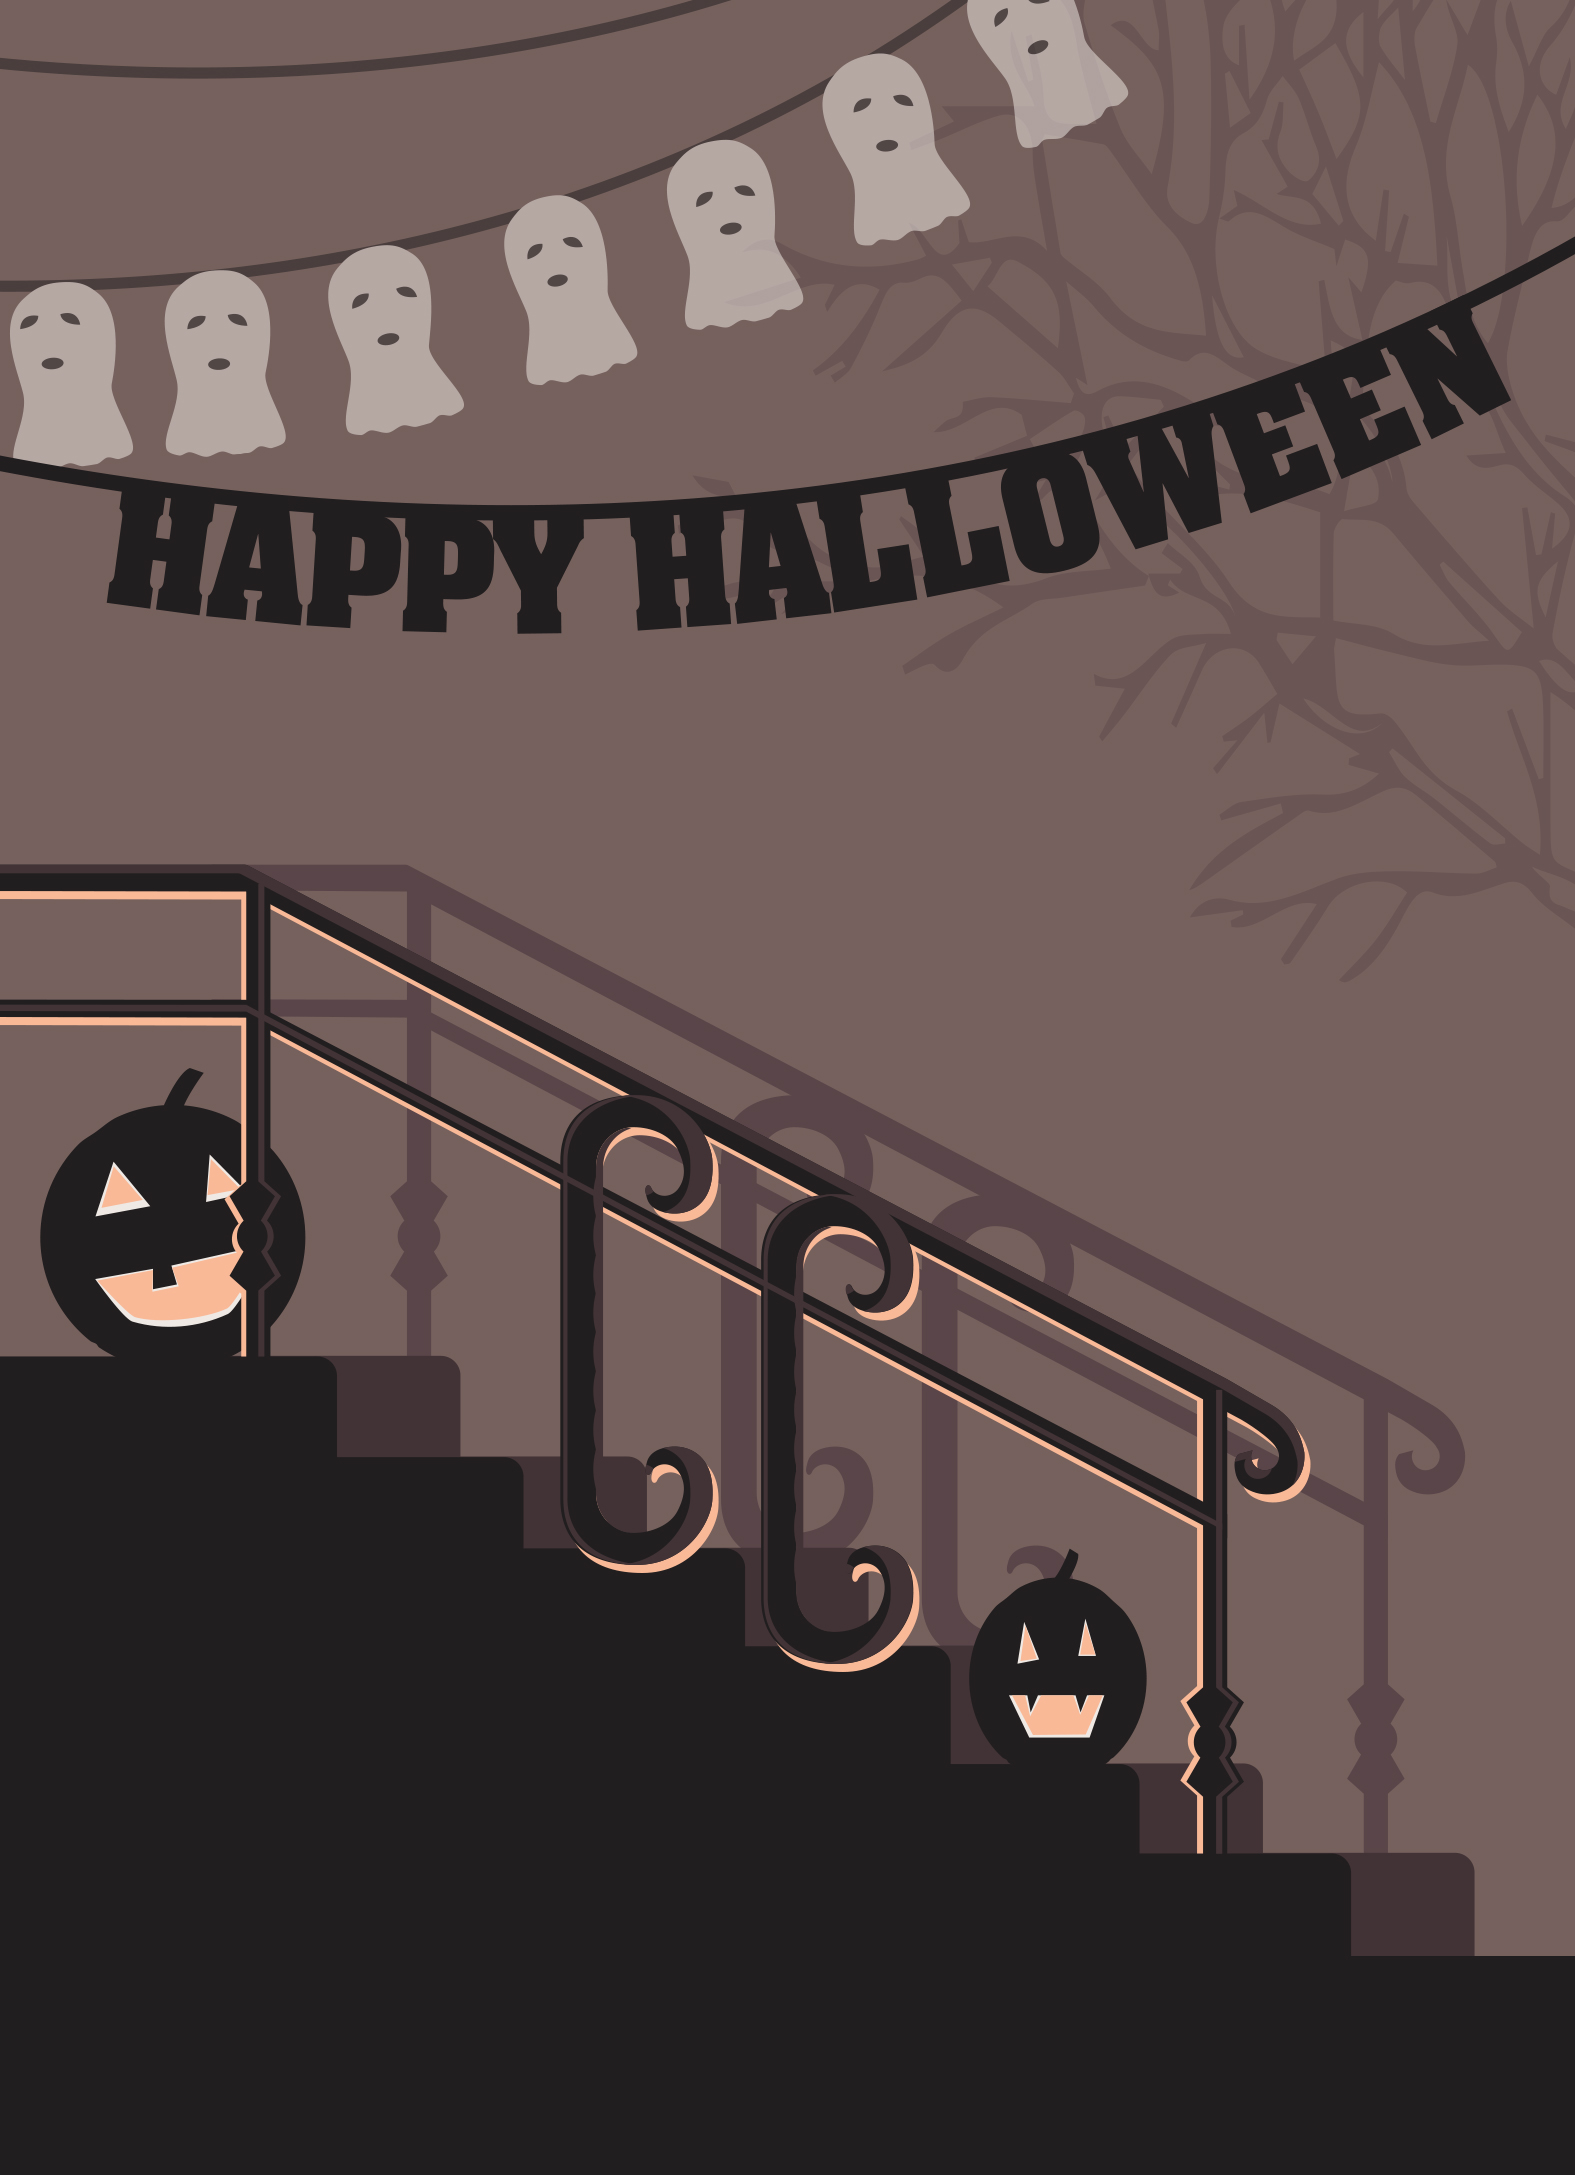 Happy-Halloween-CC.jpg